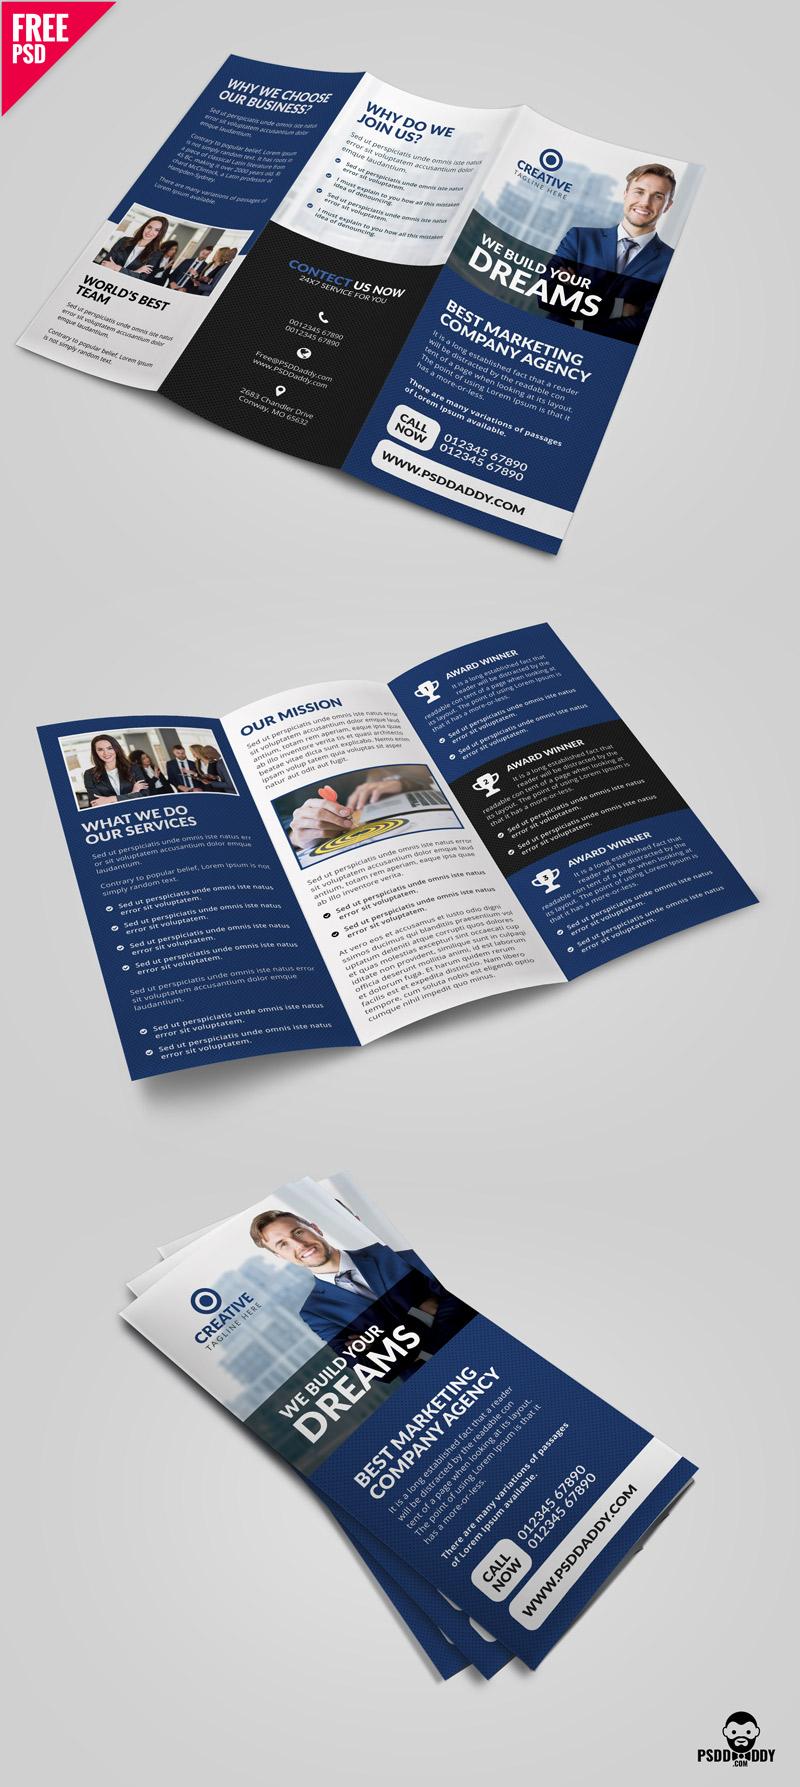 3 fold brochure, best brochure design, bi fold brochure, brochure, brochure creator, brochure design, brochure design ideas, brochure design inspiration, brochure design online, brochure design psd, brochure design services, brochure examples, brochure format, brochure ideas, brochure maker, brochure outline, brochure printing, brochure sample, brochure size, brochure templates, brochure templates free, brochure templates psd, business brochure, business card design, company brochure, corporate brochure, corporate brochure design, create brochure, creative brochure, creative brochure design, design brochure, free brochure, free brochure templates, free pamphlet template, free tri fold brochure templates, graphic designer, how to design a brochure, how to make a brochure, how to make pamphlet, leaflet design, leaflet design templates, marketing brochure, my brochure maker, online brochure maker, pamphlet design, pamphlet template, print brochures, template brochure, travel brochure template, tri fold brochure, tri fold brochure design, tri fold brochure printing, tri fold brochure template, tri fold brochure template free, trifold, trifold template, psd mockup free download, psd mockups, psd daddy, psddaddy, download psd, downloadpsd, creativepsd, creative psd, psd freebies, psd download, freebies, free download psd,